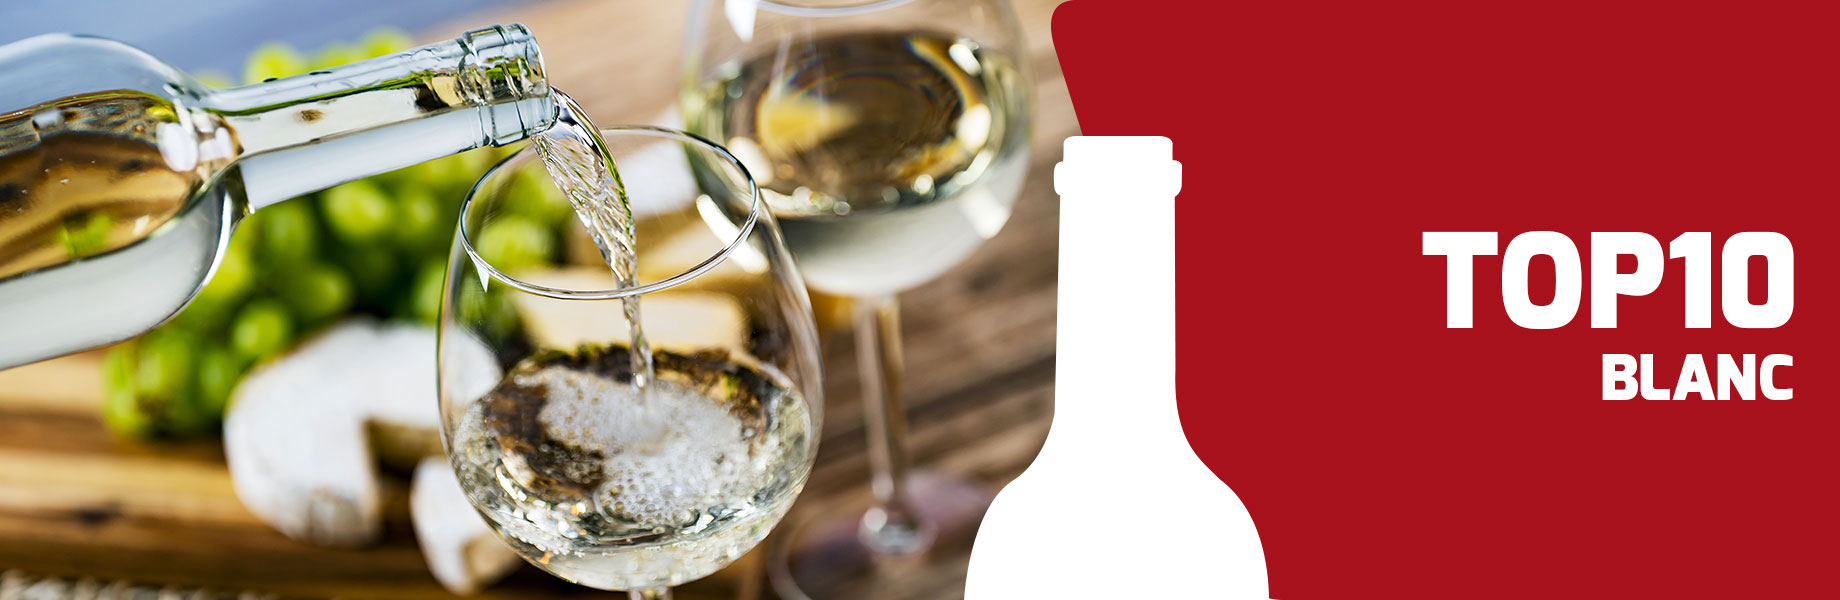 Top 10 vin blanc